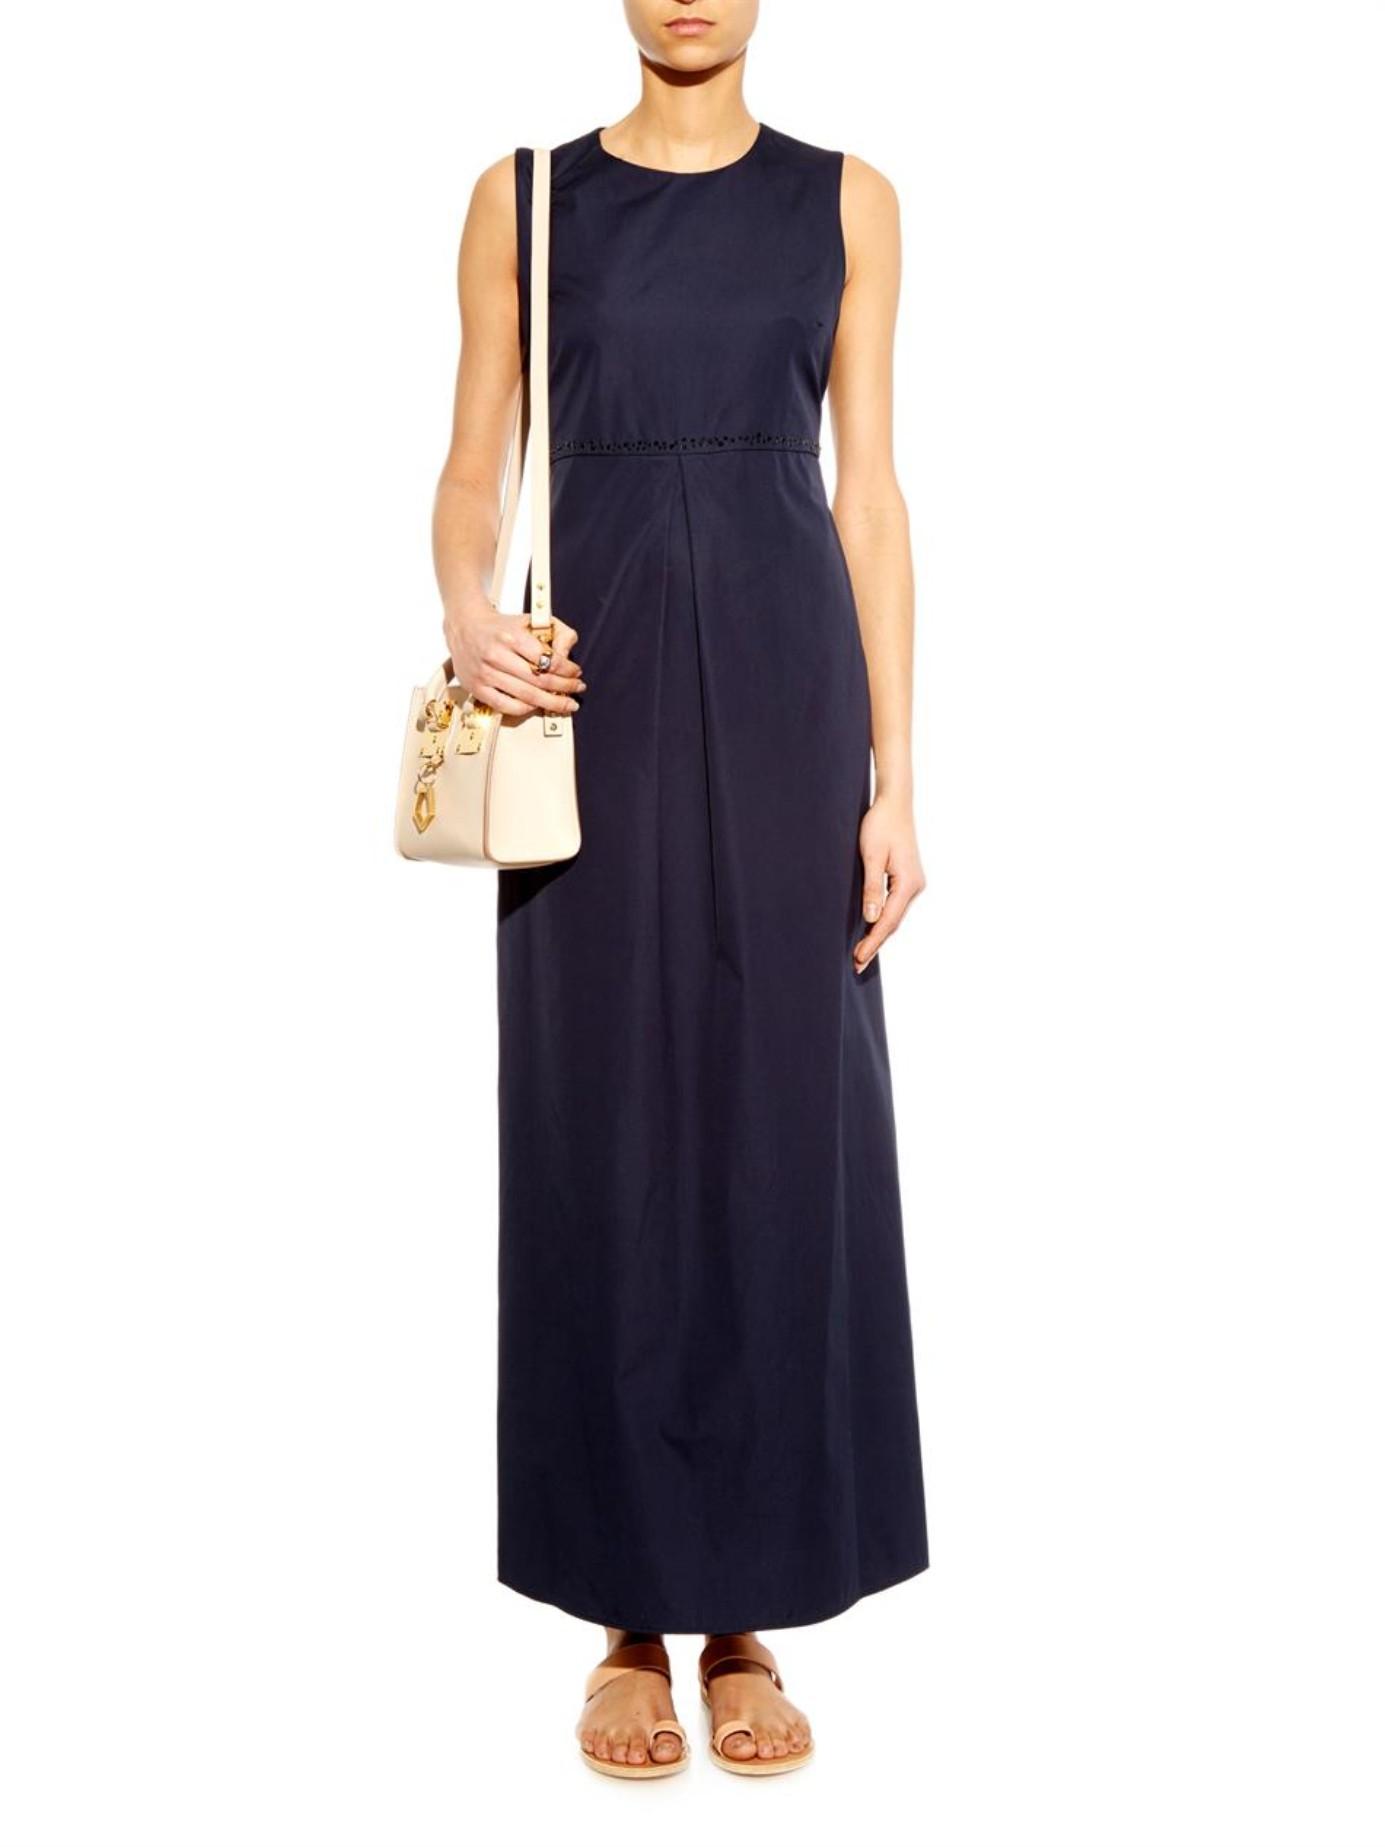 Lyst S Max Mara Fosco Dress In Blue